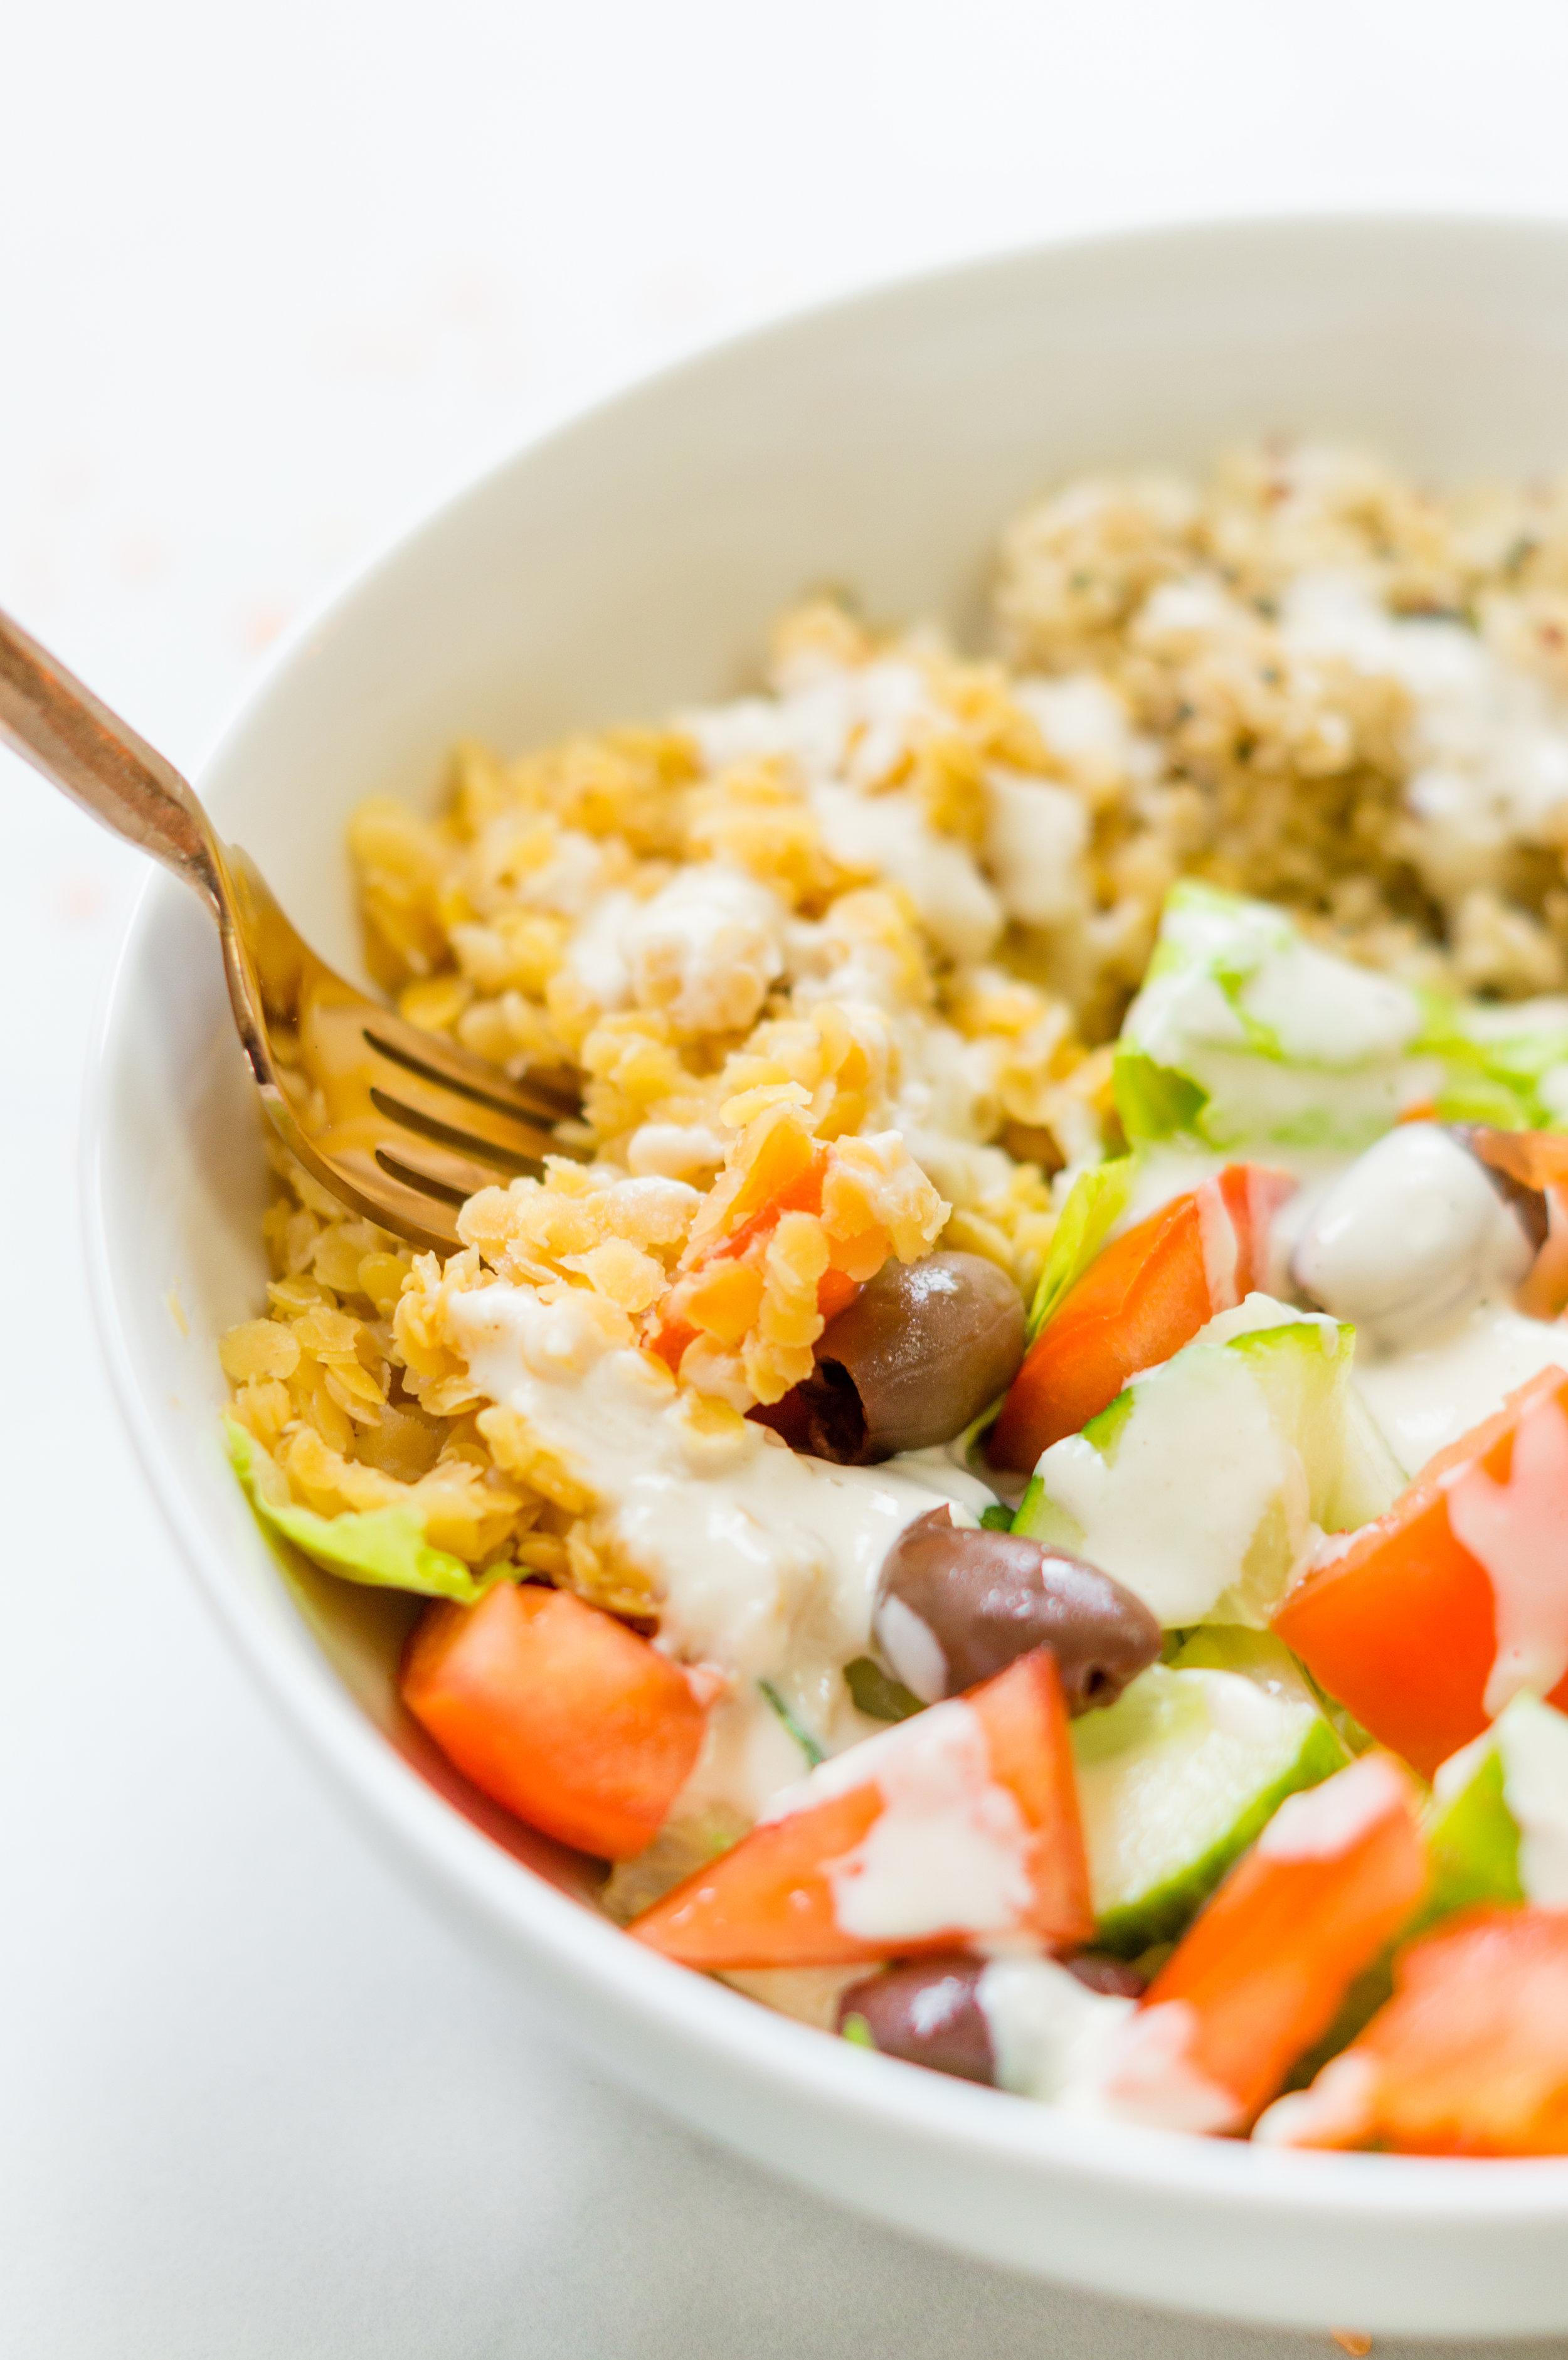 i am rorie, iamrorie.com, i am rorie recipes, i am rorie food, i am rorie mediterranean lentil salad, mediterranean lentil salad, mediterranean style food,easy vegan salad, easy salad recipe, vegan salad recipe, plant protein, salad with protein recipe, vegan salad with protein recipe, red split lentils, roma tomatoes, kalamata olives, cucumbers, lentils,plant based protein, chicago food blogs, i am rorie chicago food blogger, lemon tahini yogurt dressing, vegan salad dressing recipe, vegan salad dressing, how to cook lentils, how to get more protein in a vegan diet, vegan protein, ways to add more protein to your diet when you're vegan, mason jar meals, mason jar salad recipe, mason jar meal vegan, whole foods, clean eating recipes, clean eating vegan recipes, clean eating meal